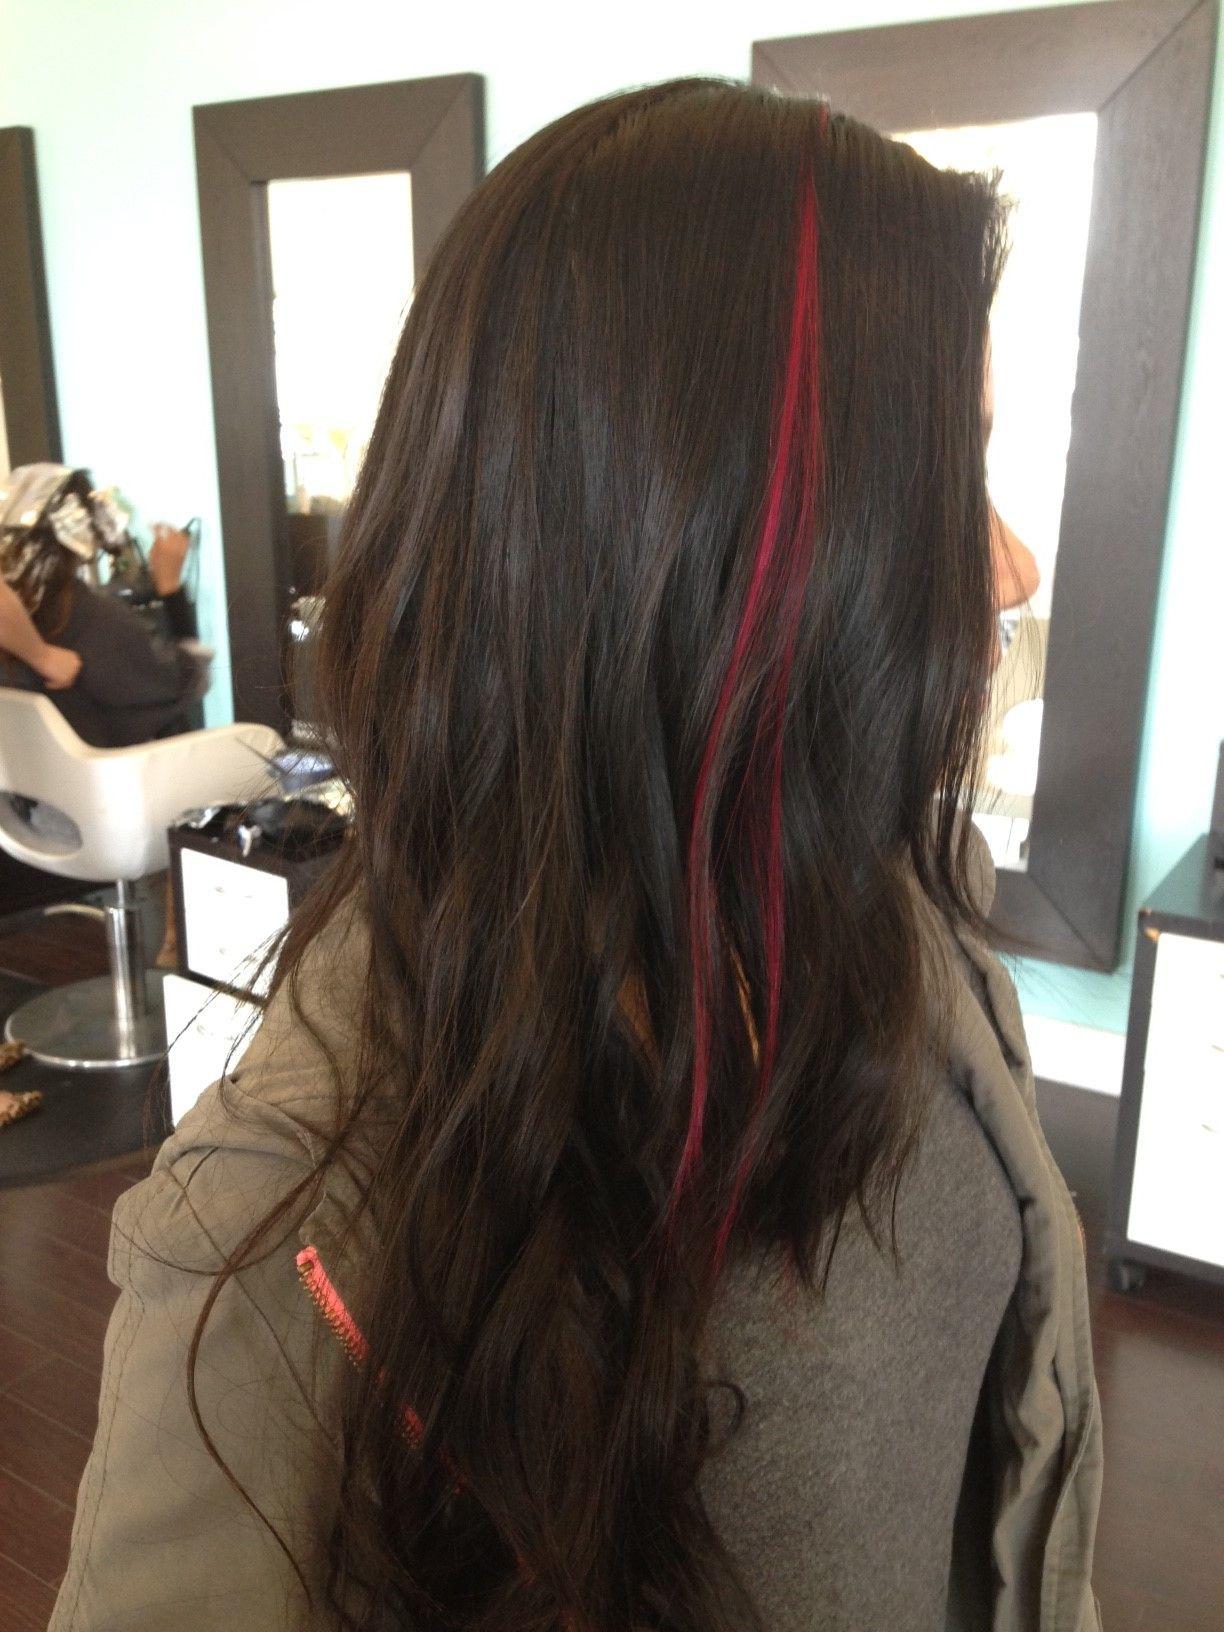 Hot Pink Streak By Sop Originals Hair Extensions Streak For